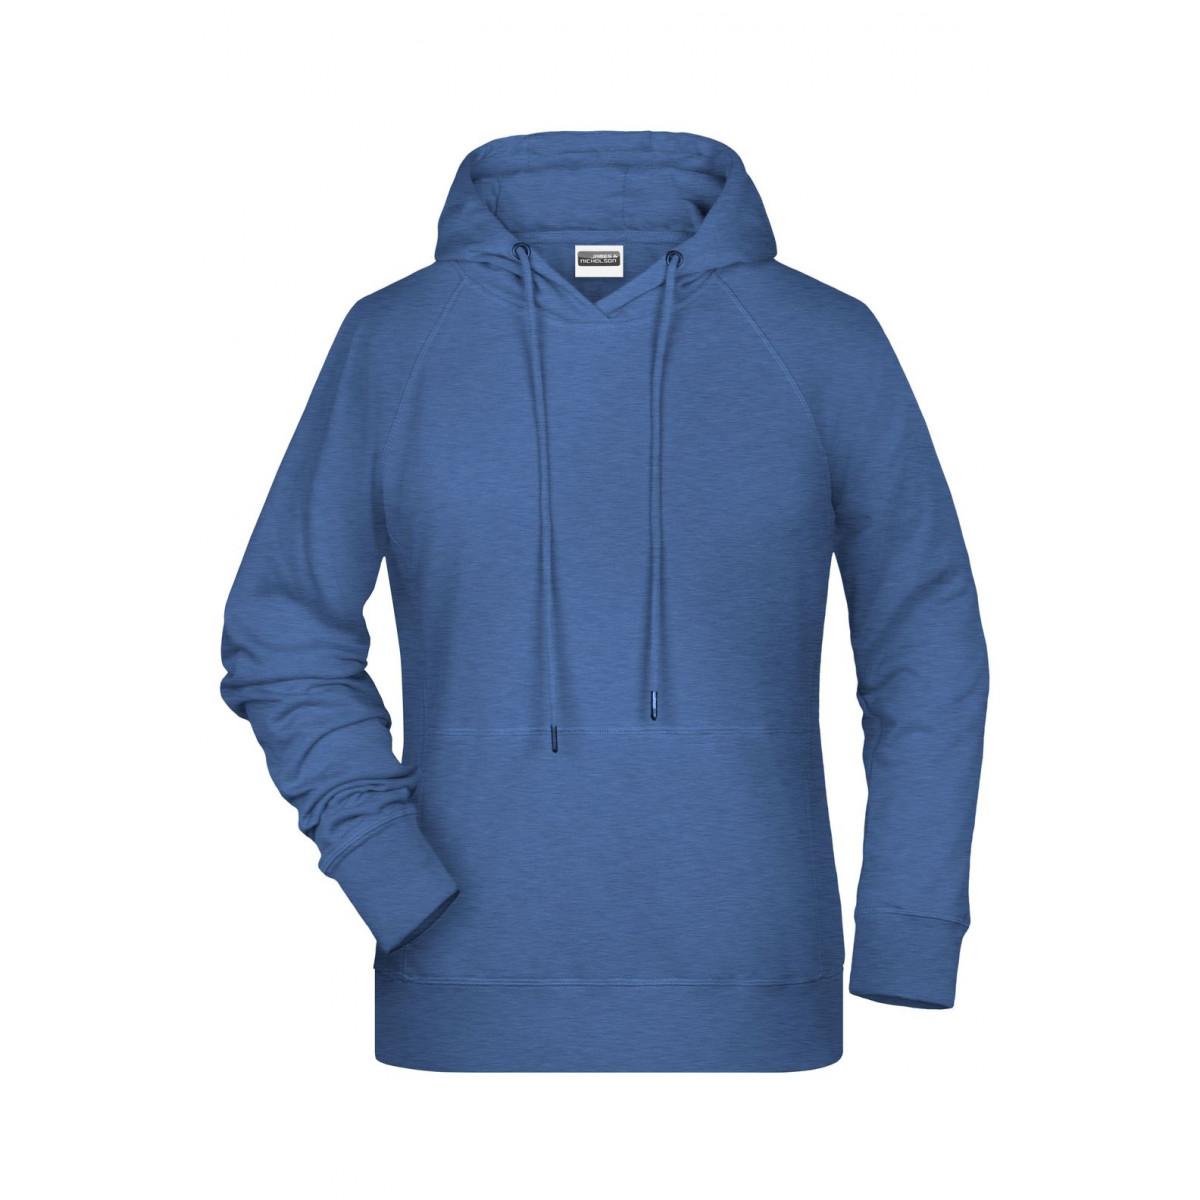 Толстовка женская 8023 Ladies Hoody - Светло-синий меланж